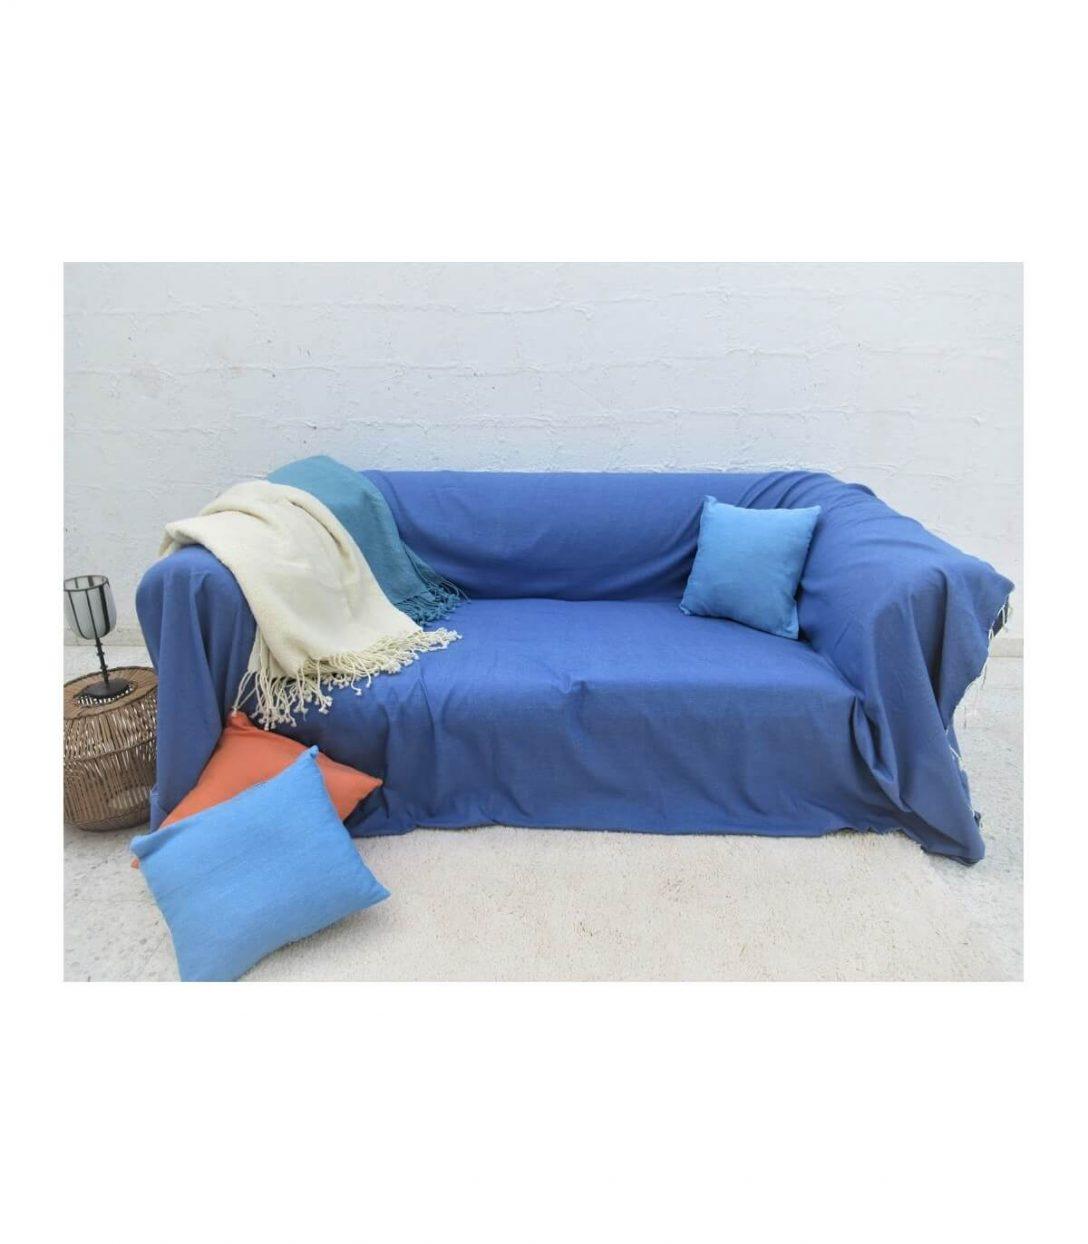 Large Size of überwurf Sofa Sofaberwurf Blautagesdecke Couch Blau Baumwolle Langes Barock Abnehmbarer Bezug Großes Comfortmaster Himolla Antikes Auf Raten Terassen Big Sofa überwurf Sofa